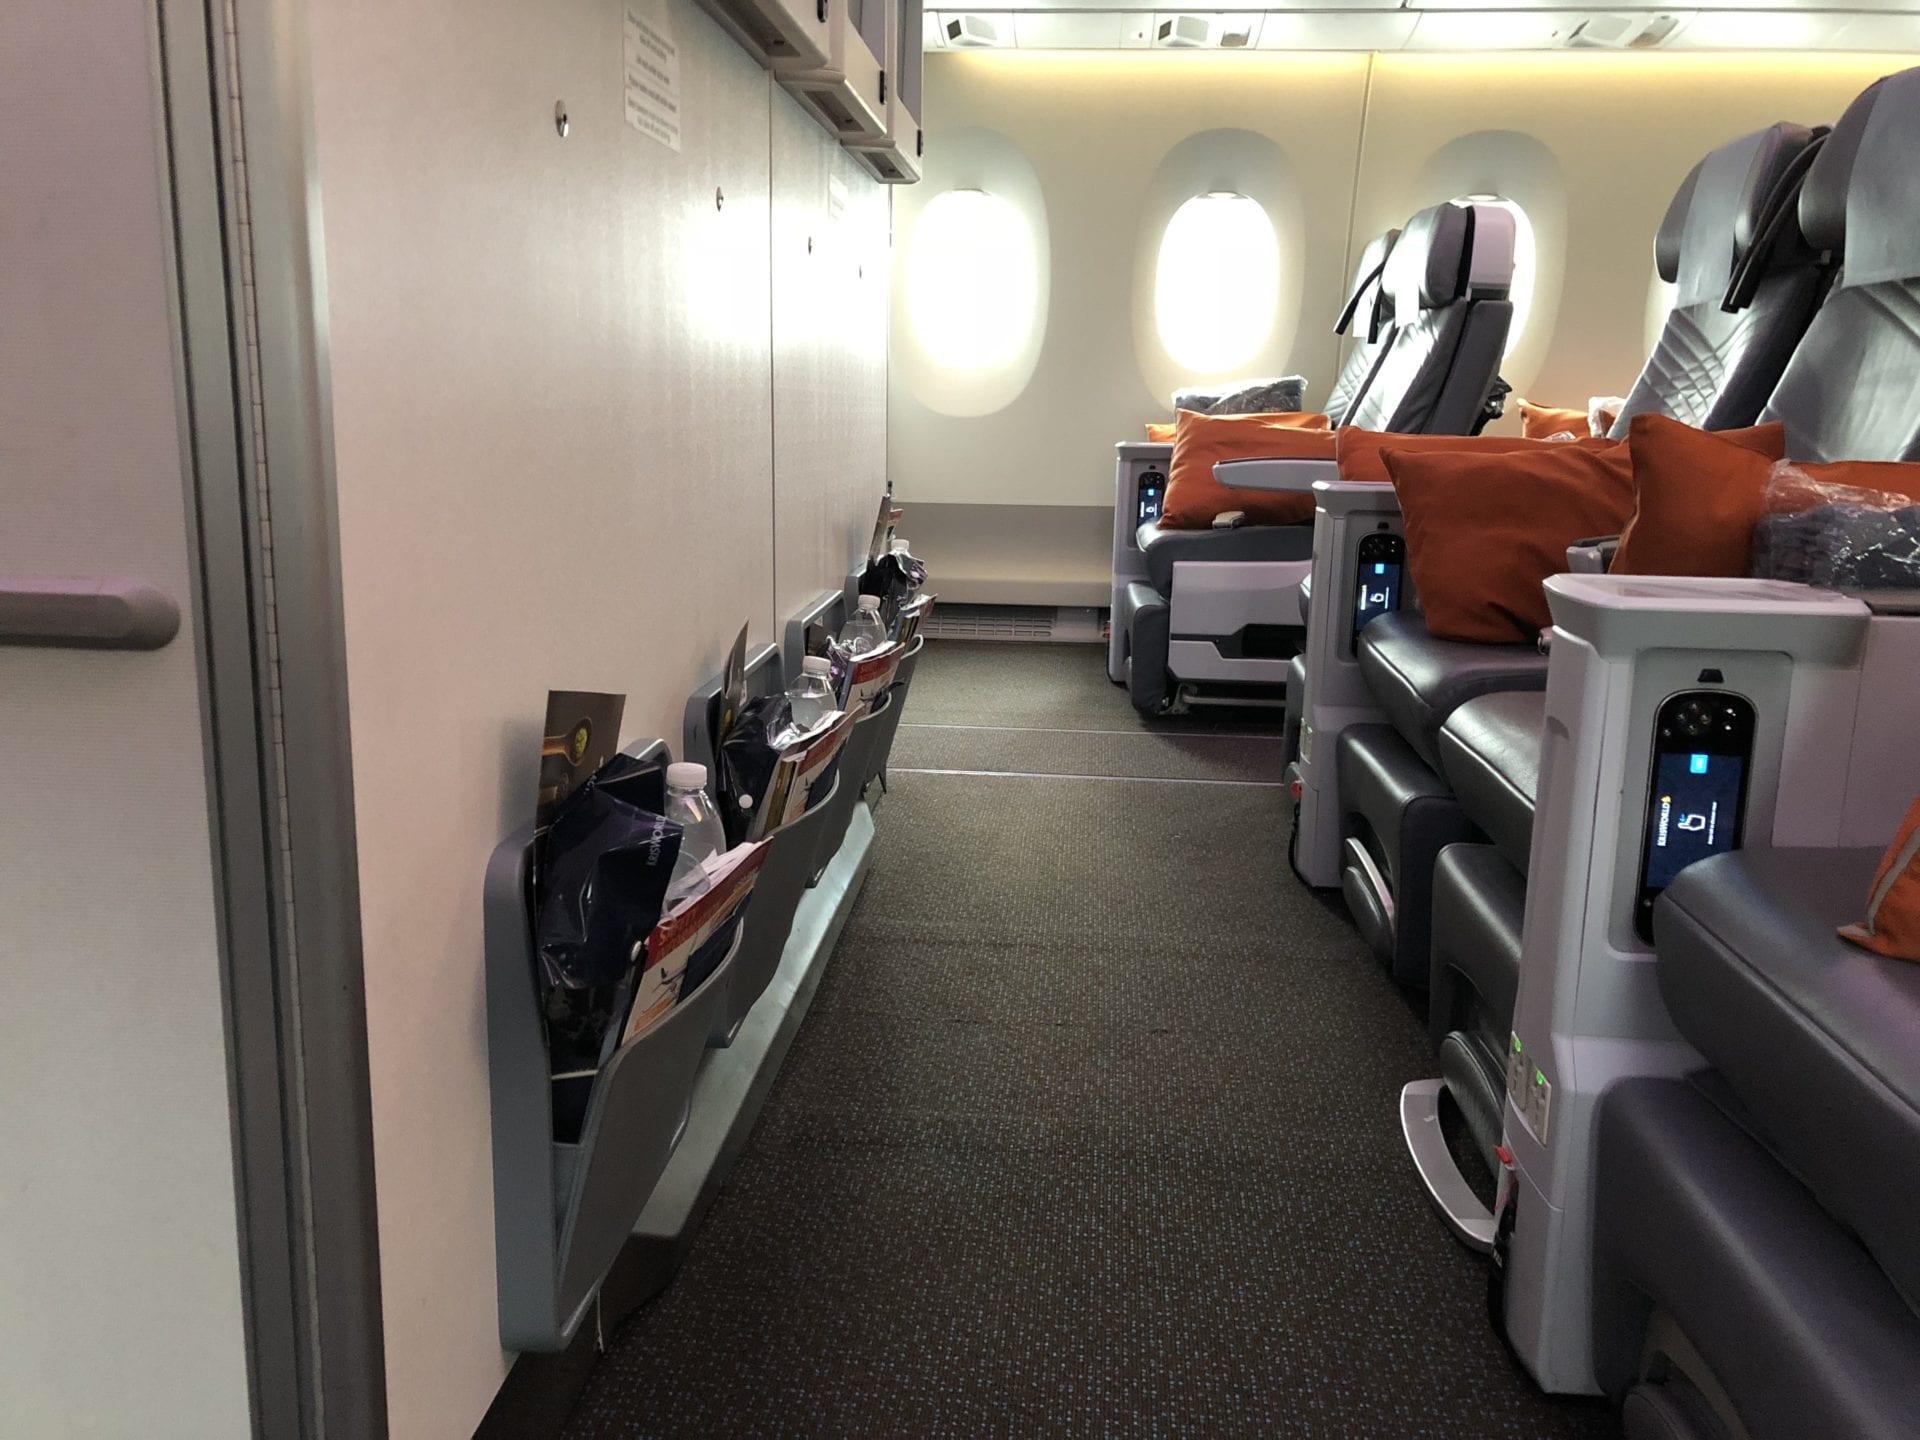 Singapore Airlines Premium Economy Class Bulkhead 2